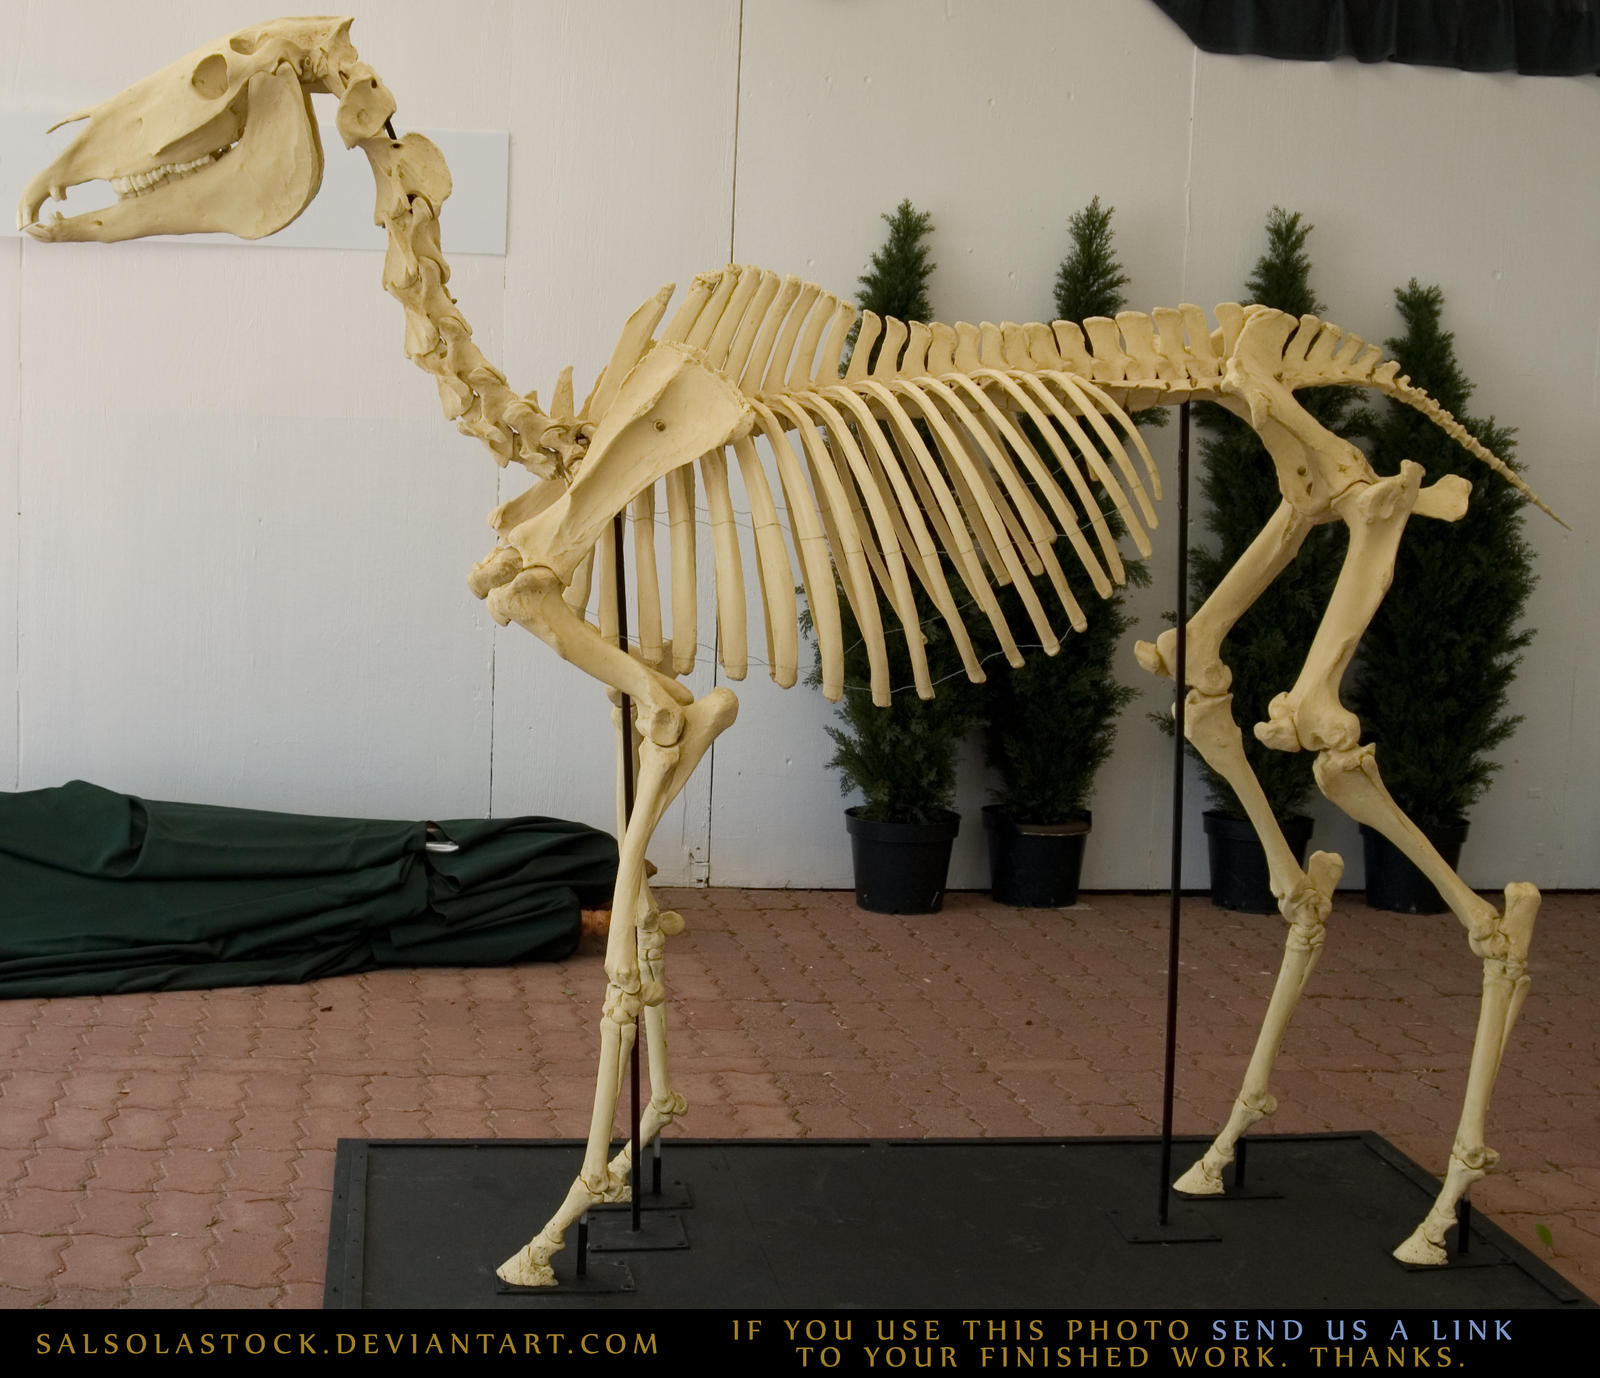 horse_skeleton_3_by_salsolastock-d1j3rhd